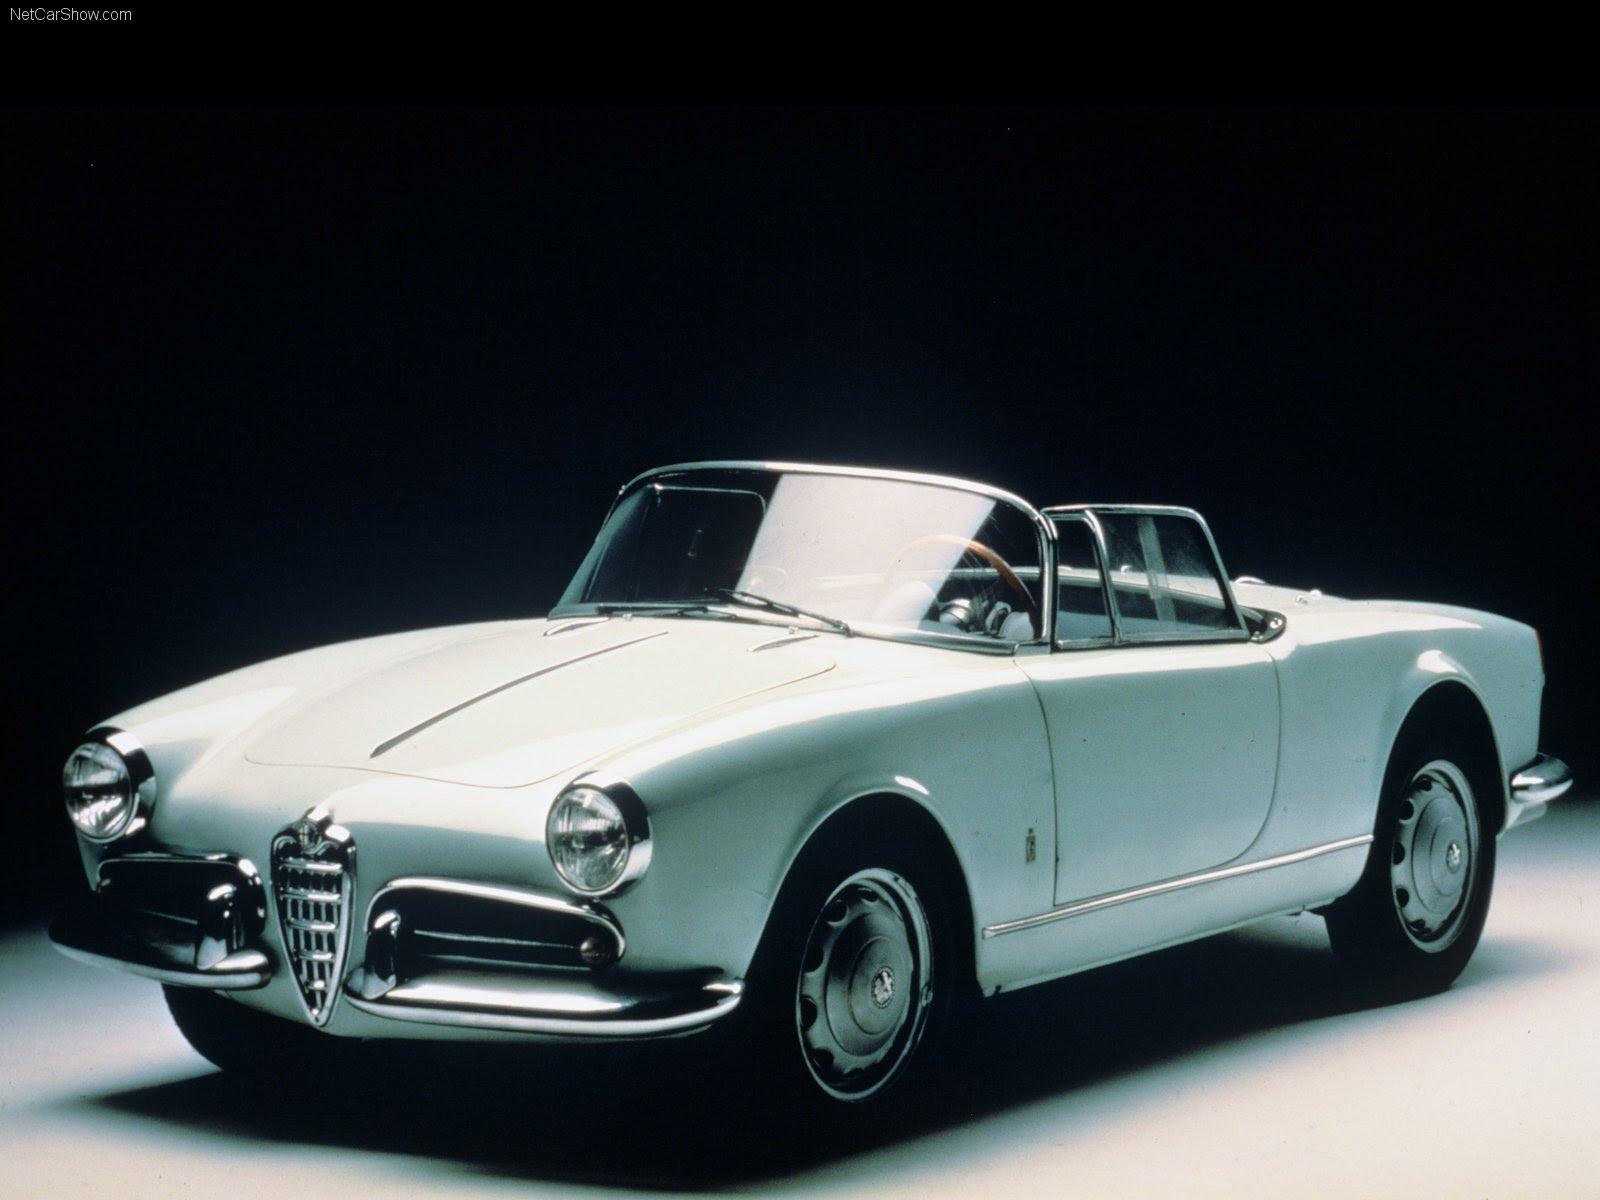 Alfa Romeo Giulietta Spider classic cars convertible wallpaper  1600x1200  616348  WallpaperUP